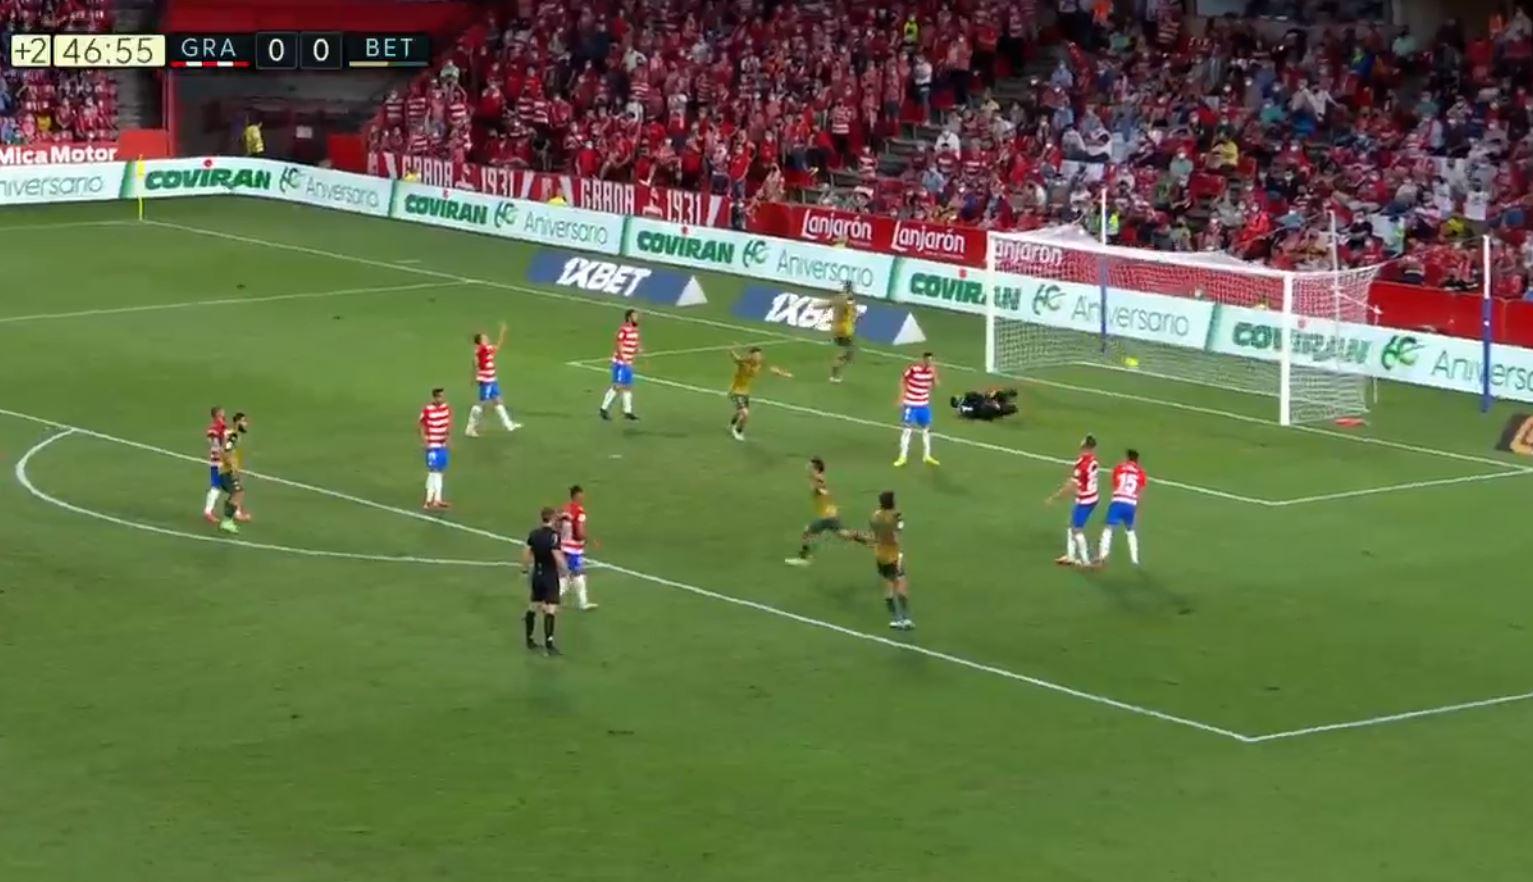 Granada 1-2 Real Betis (2021-09-13) Full Goals Highlight Extended Video